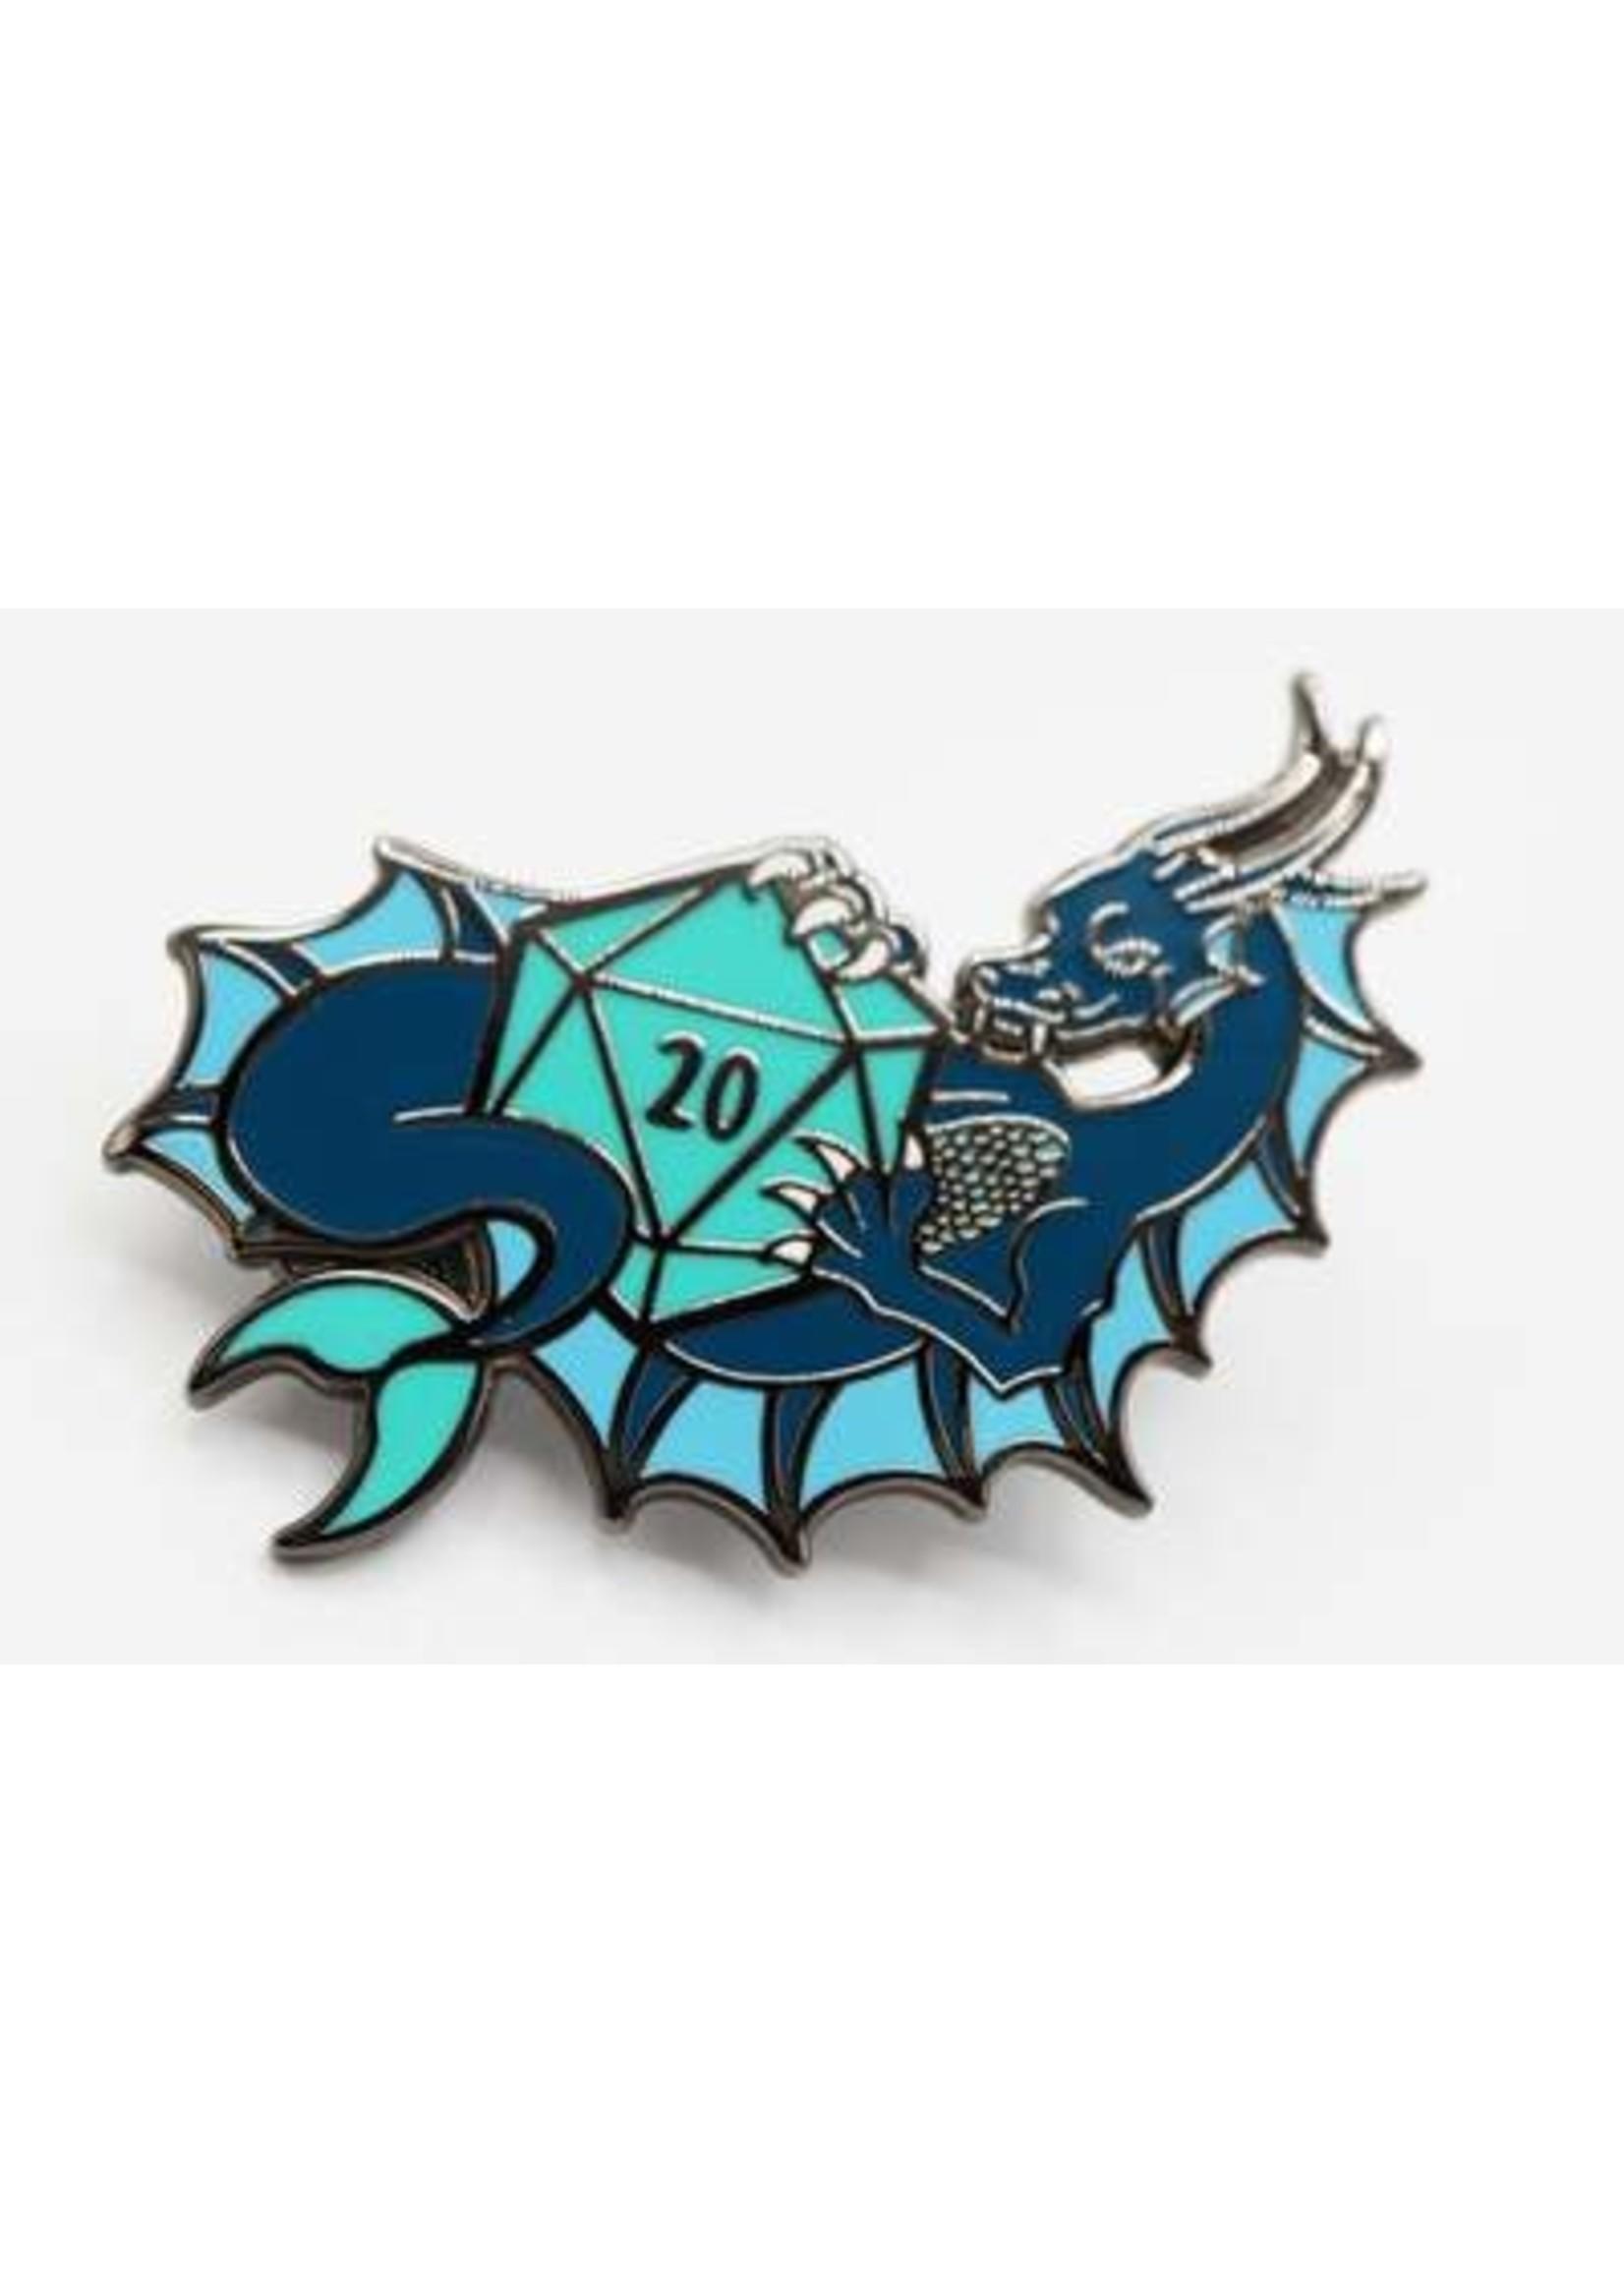 Dice Dragons Pin: Water